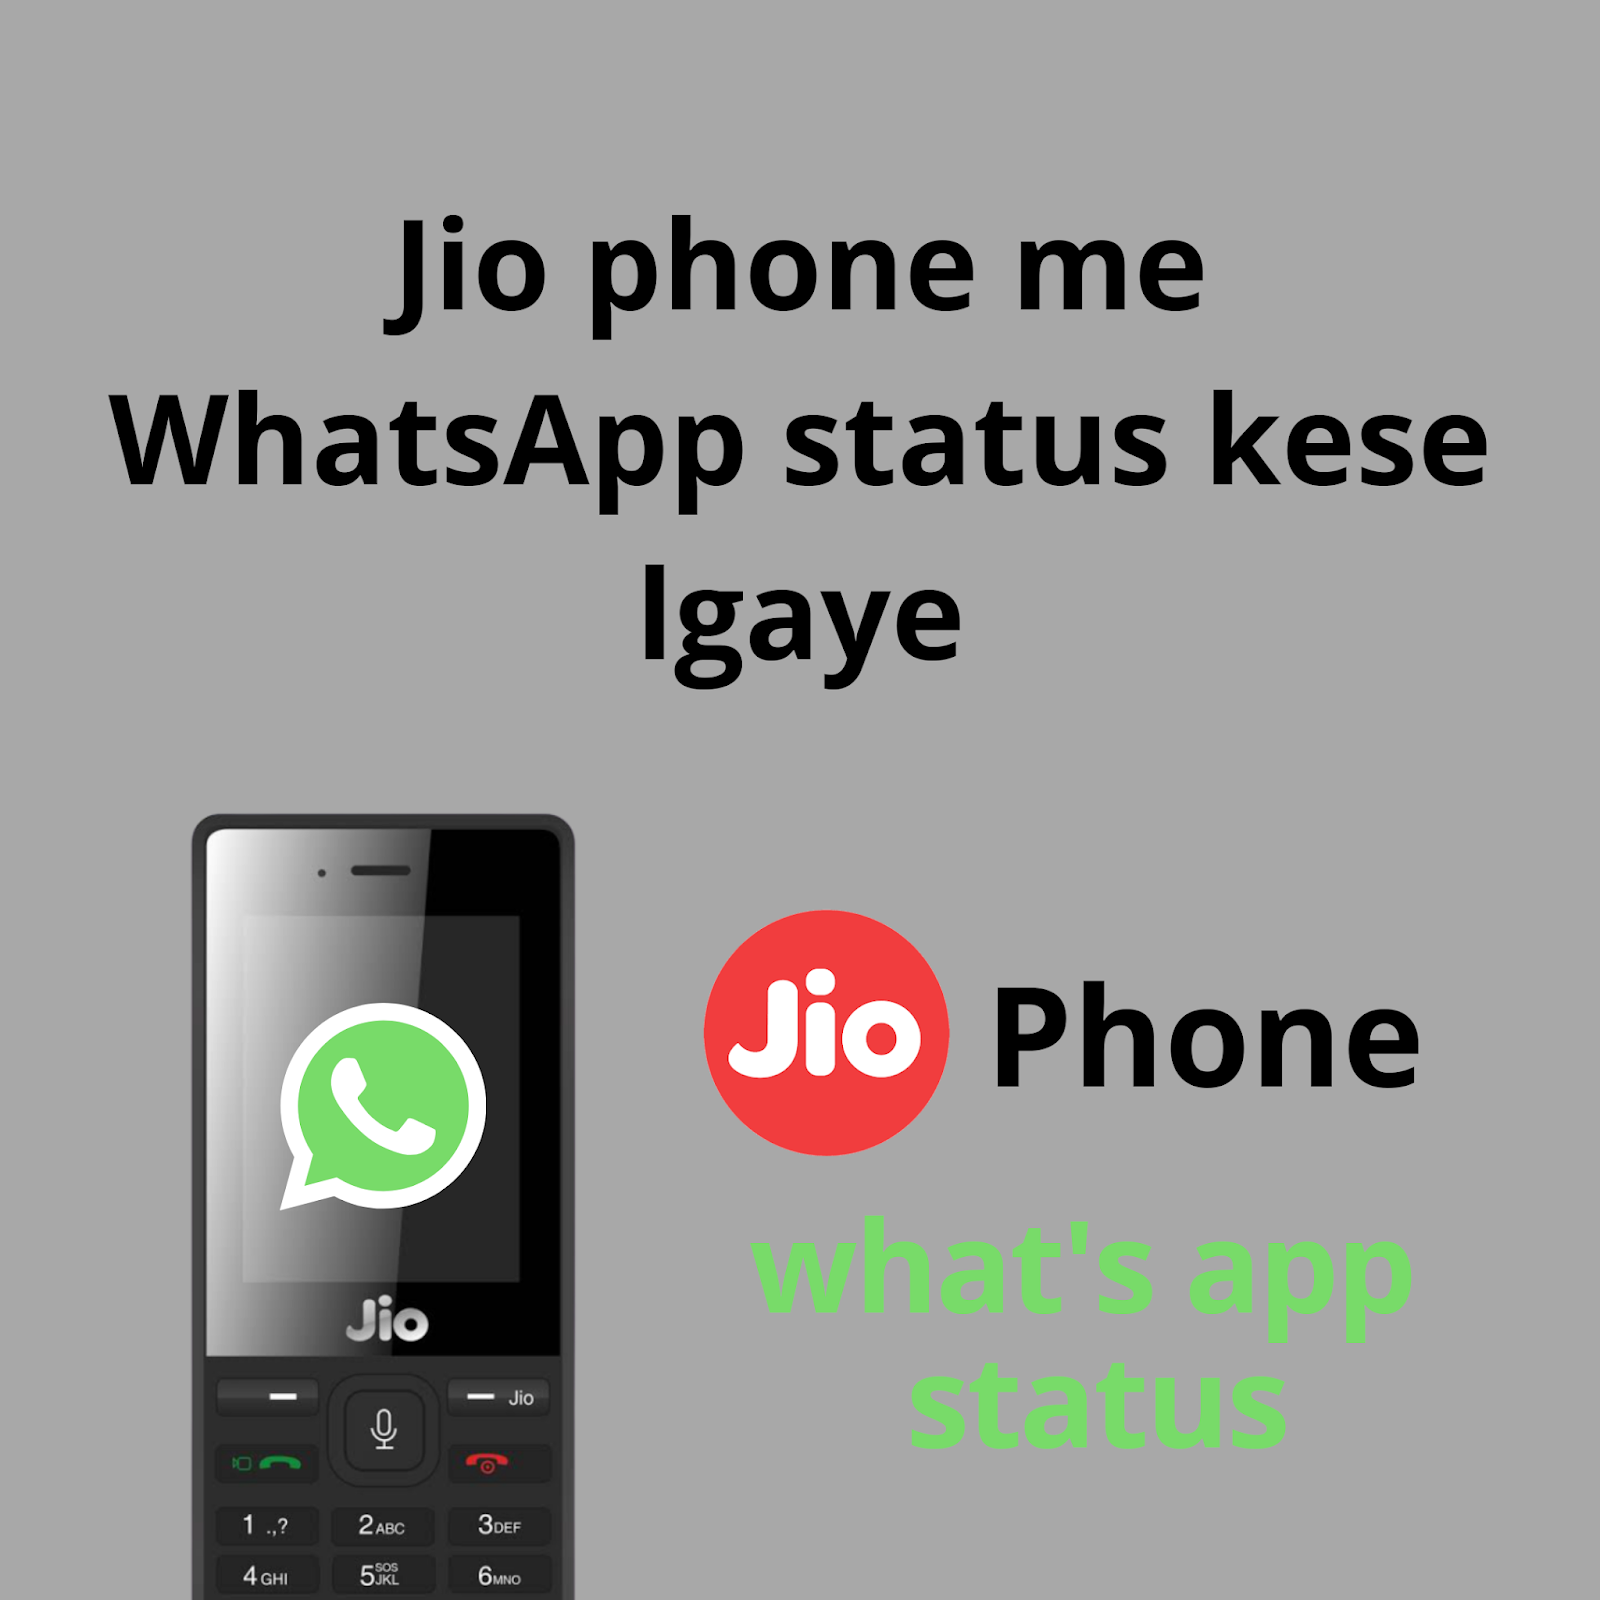 Jio phone me whatsapp status kese lgaye 2020